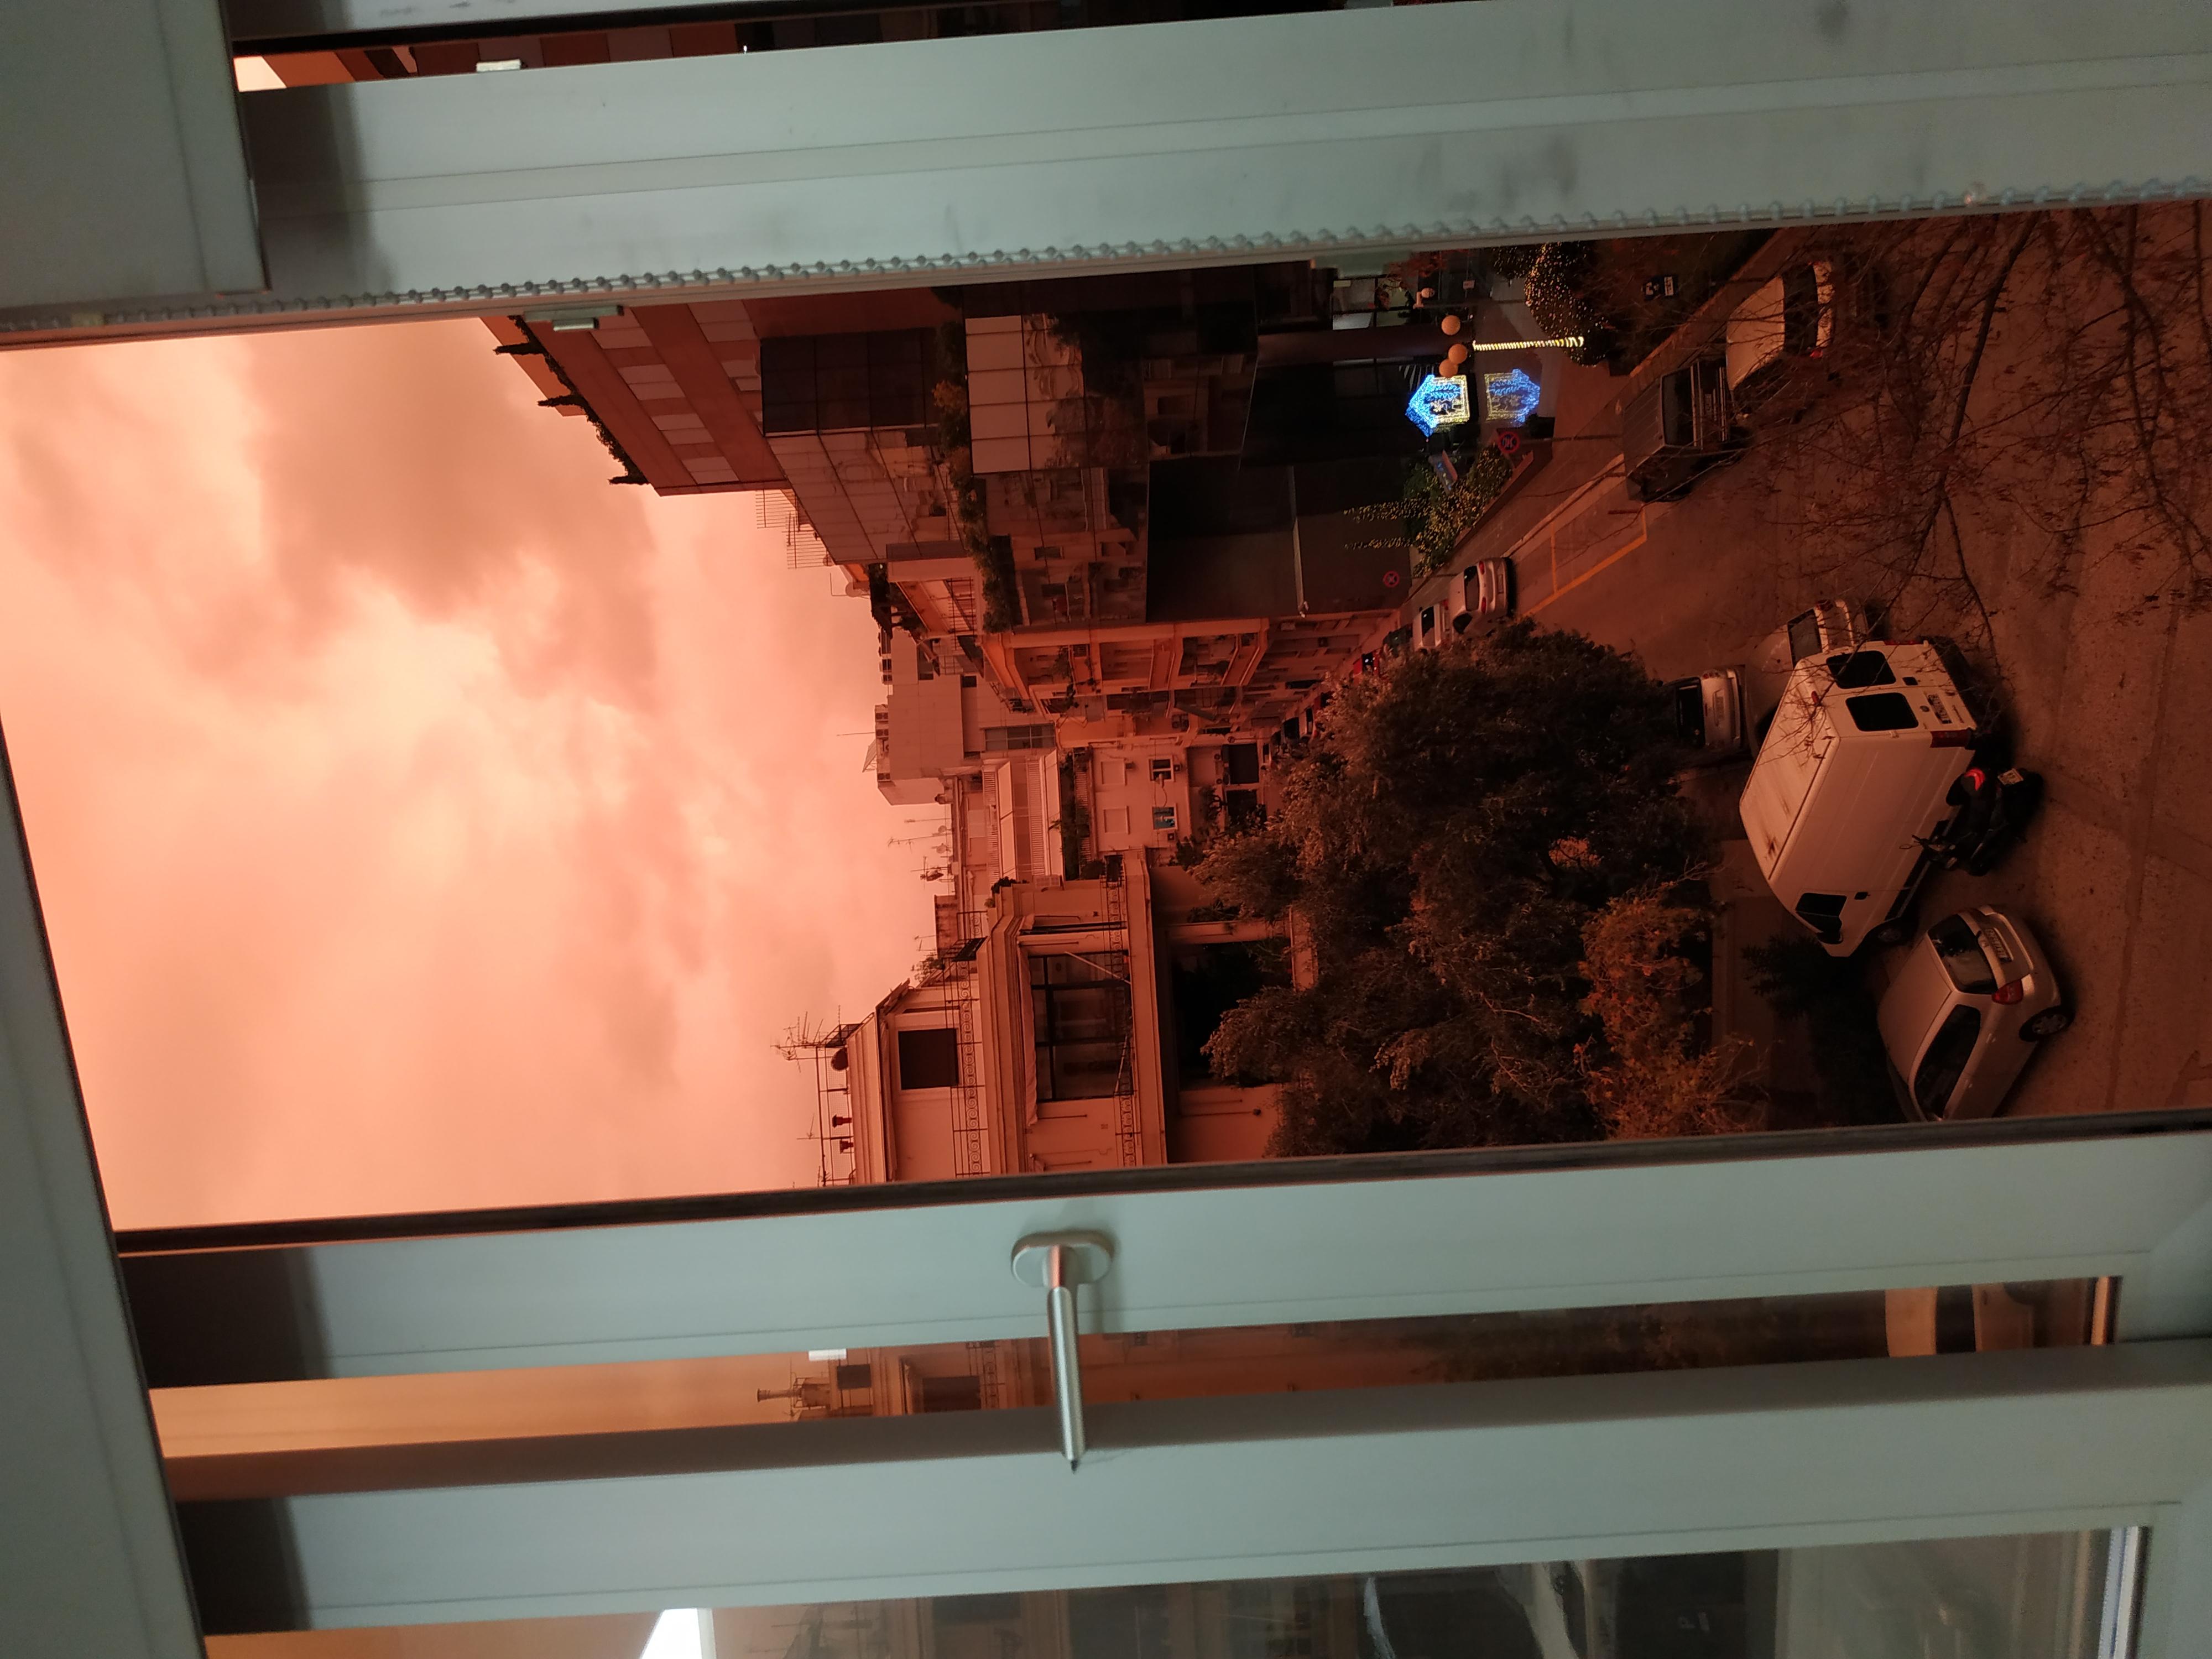 Viral ο κατακόκκινος ουρανός της Αθήνας το ξημέρωμα -Απίστευτες εικόνες